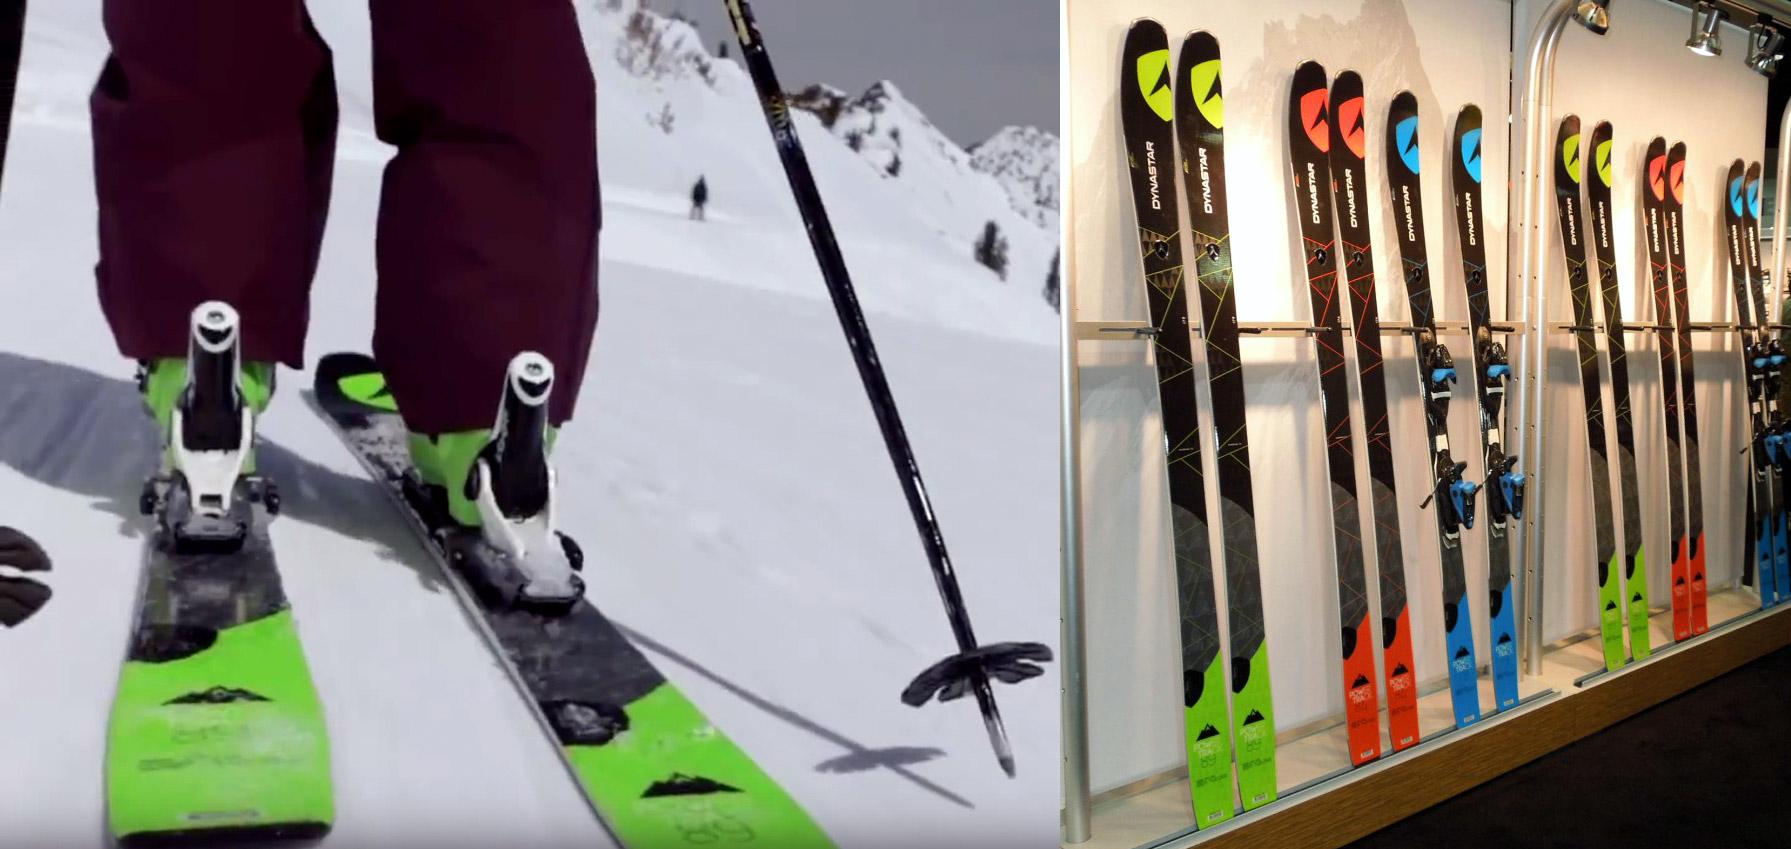 dynastar-skis-powertrack-07